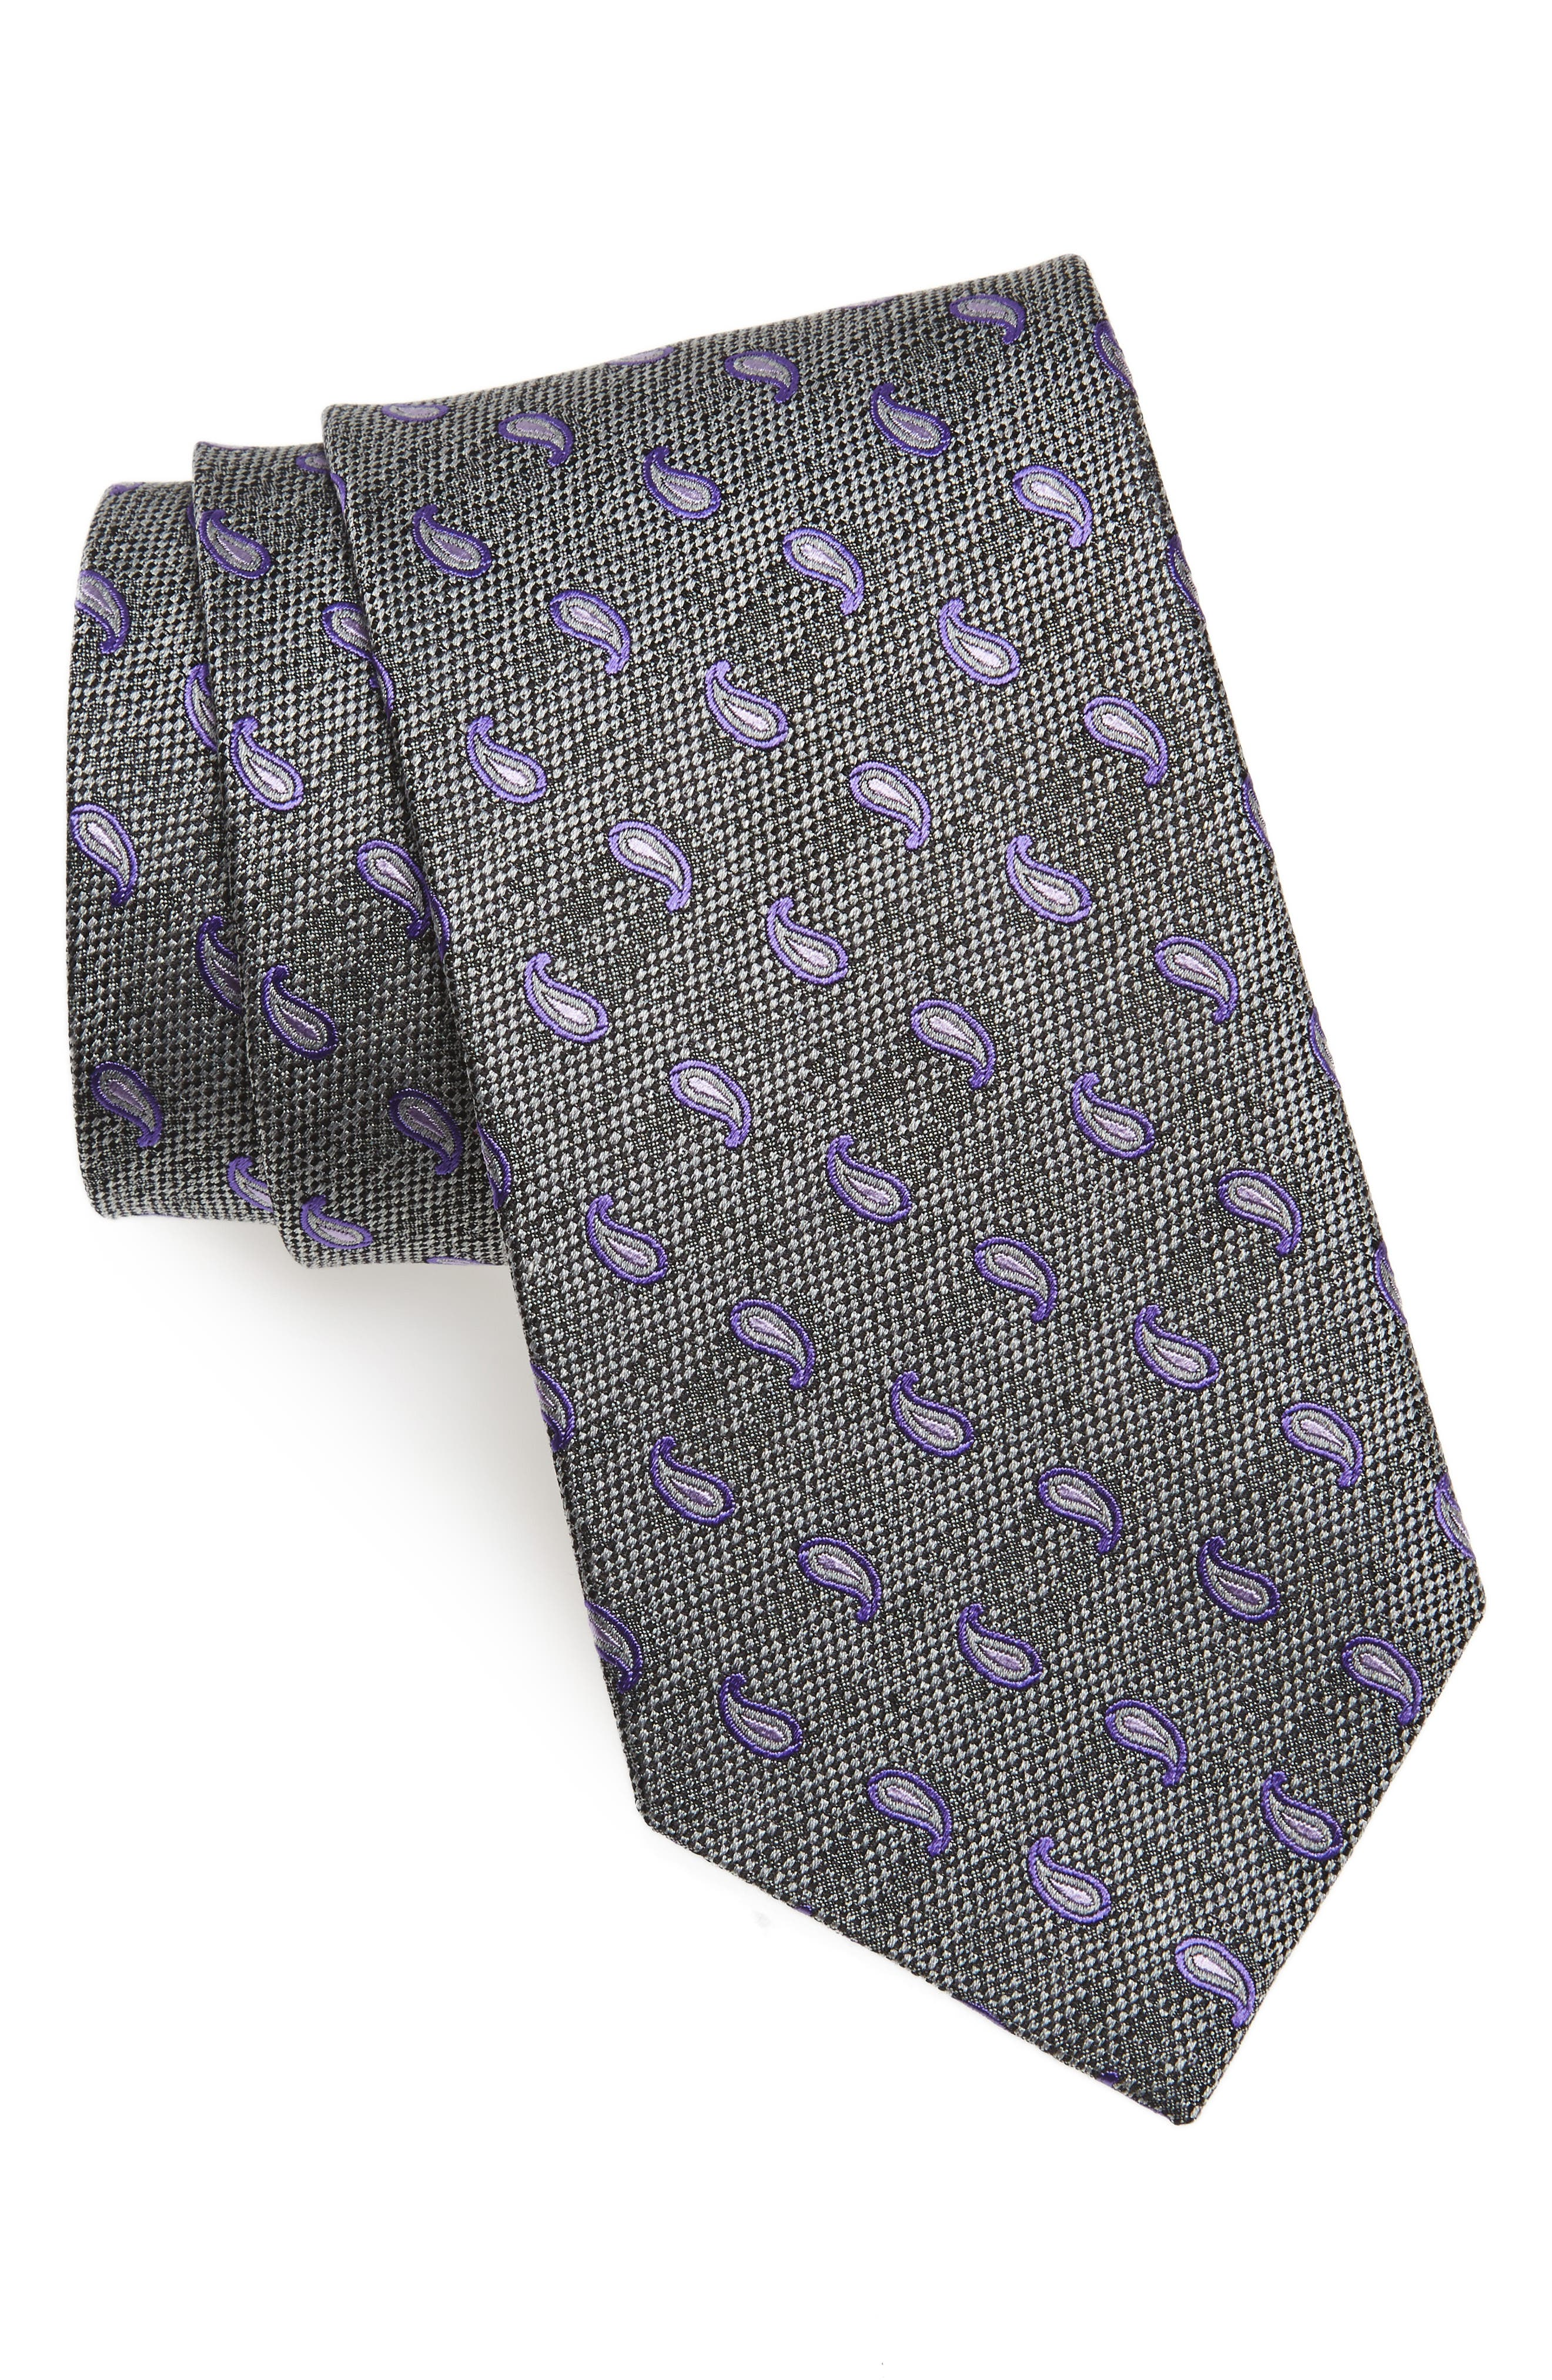 Paisley Silk Tie,                             Main thumbnail 1, color,                             025